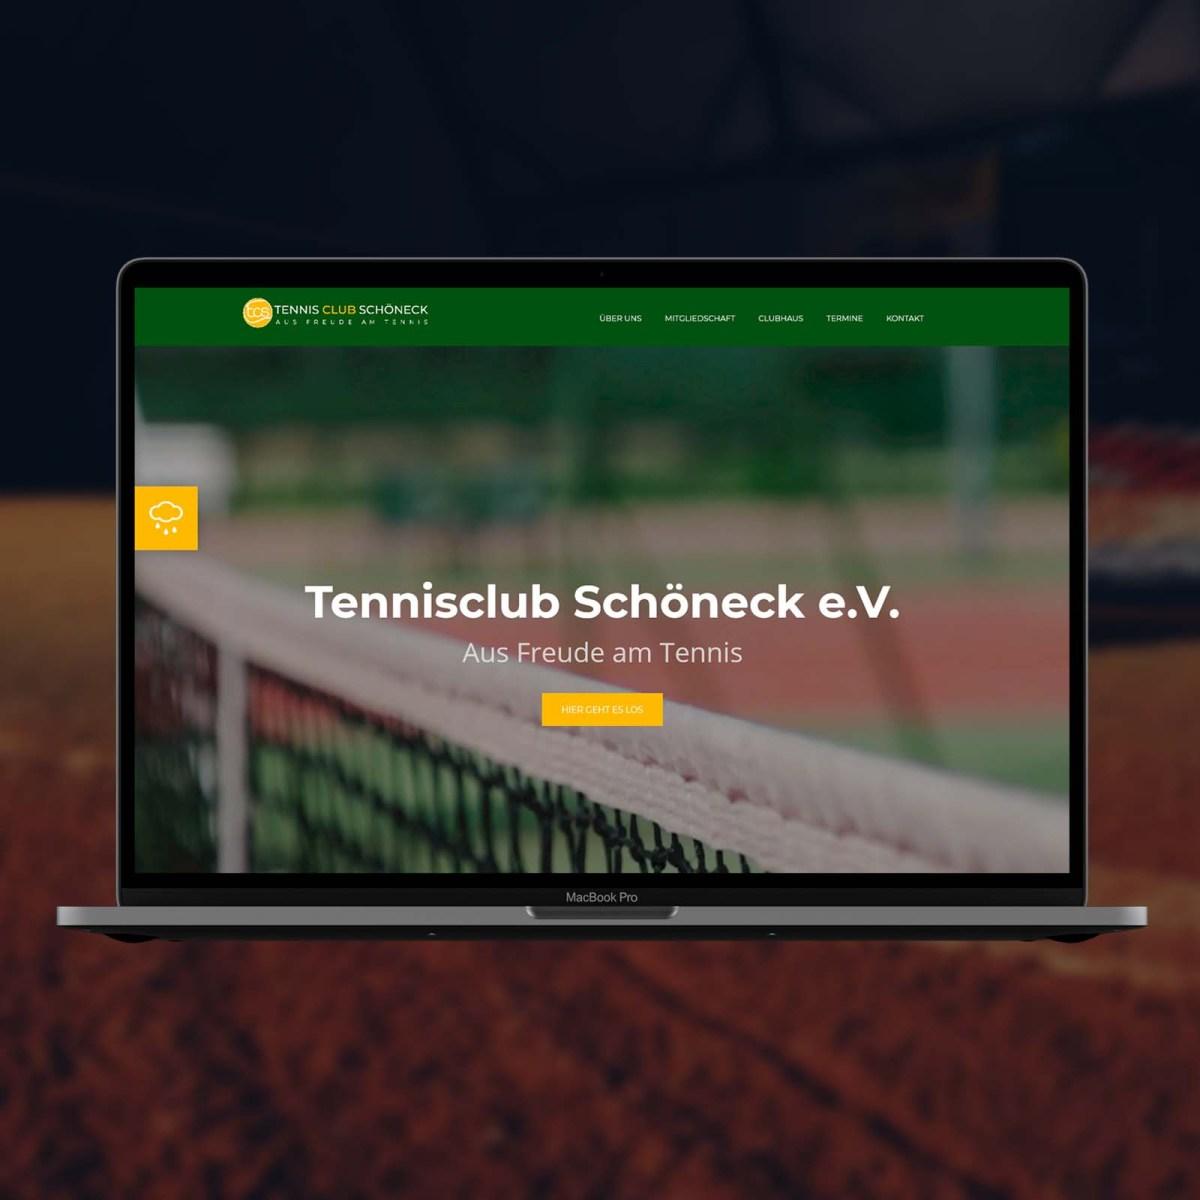 Tennisclub Schöneck Website